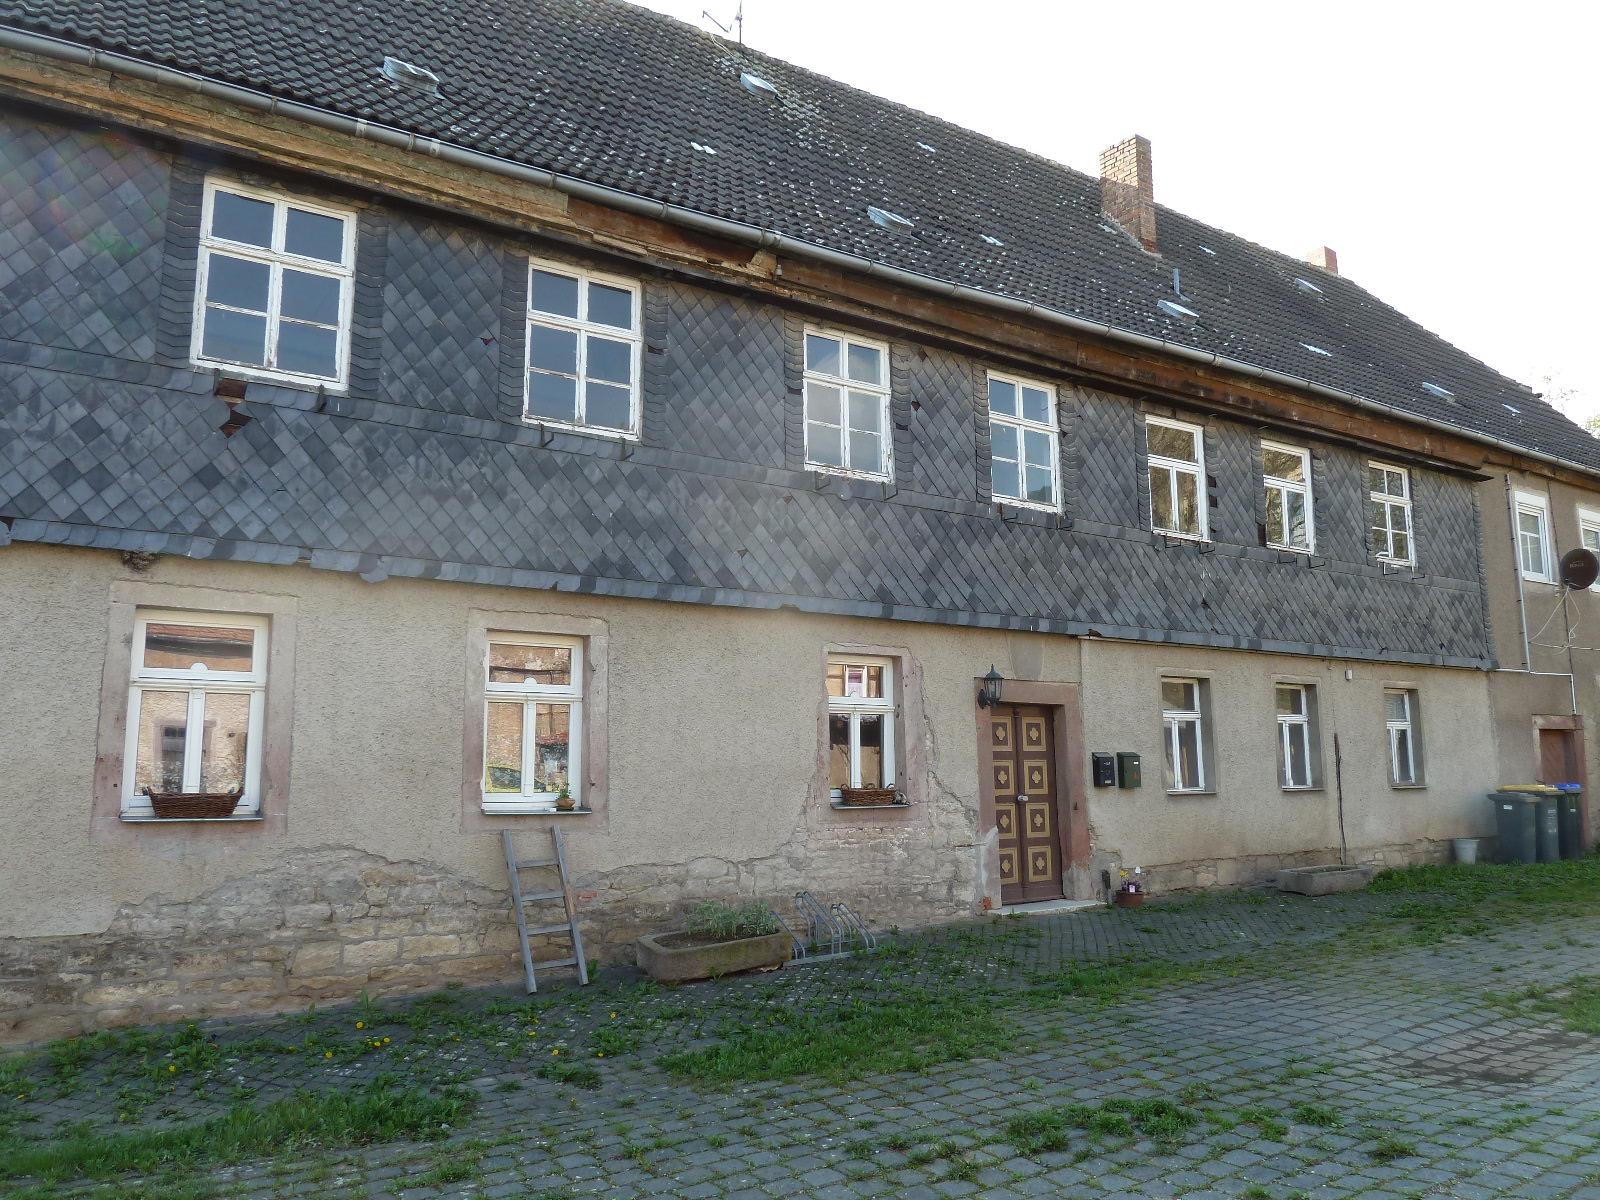 KlosterhofGorslebenvorneLEG.JPG